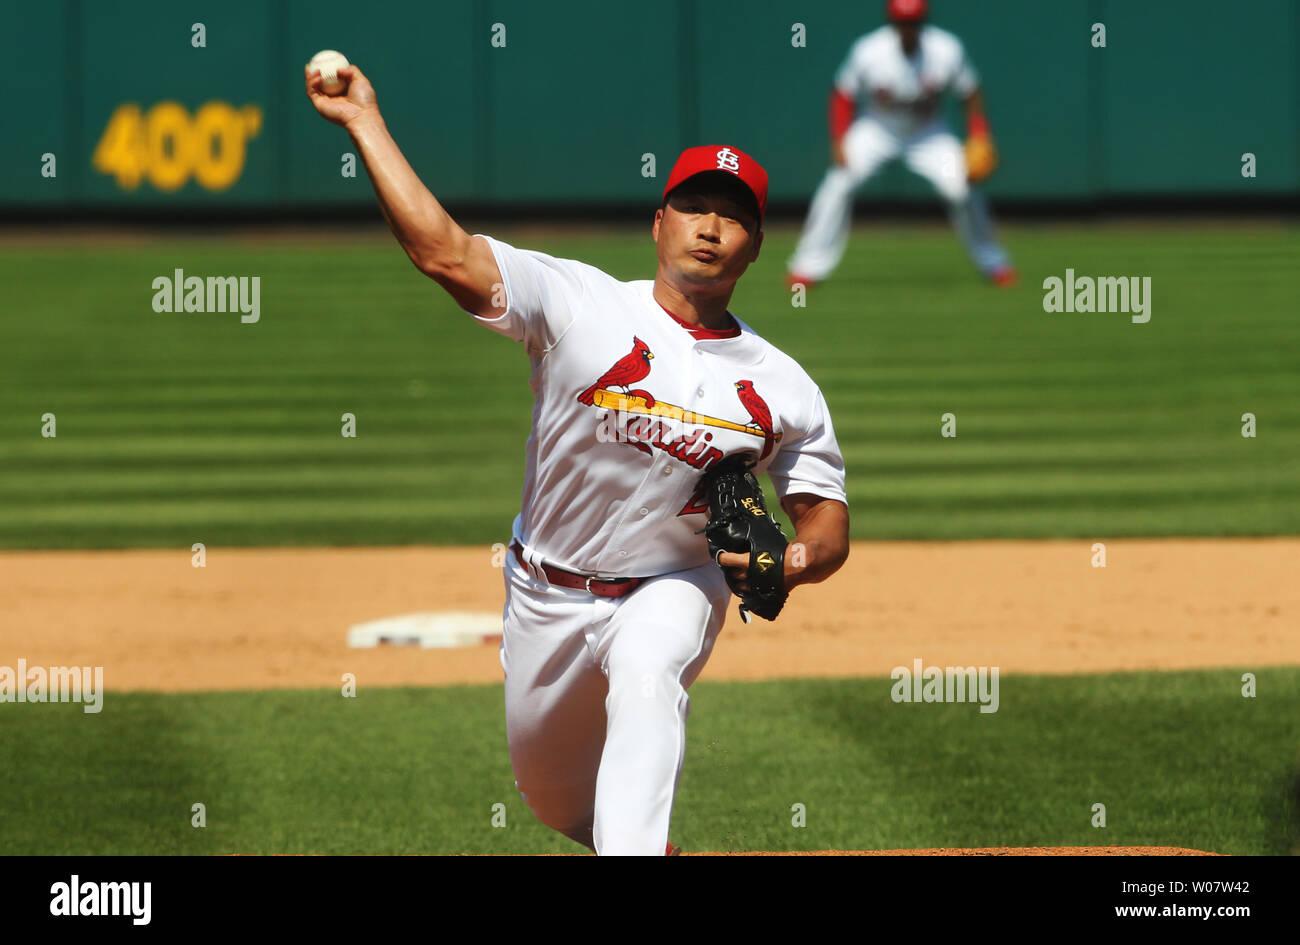 Louis Cardinals pitcher Seung Hwan Oh offre un passo di San Diego Padres al Busch Stadium di St Louis sulla luglio 20, 2016. Foto di Bill Greenblatt/UPI Foto Stock